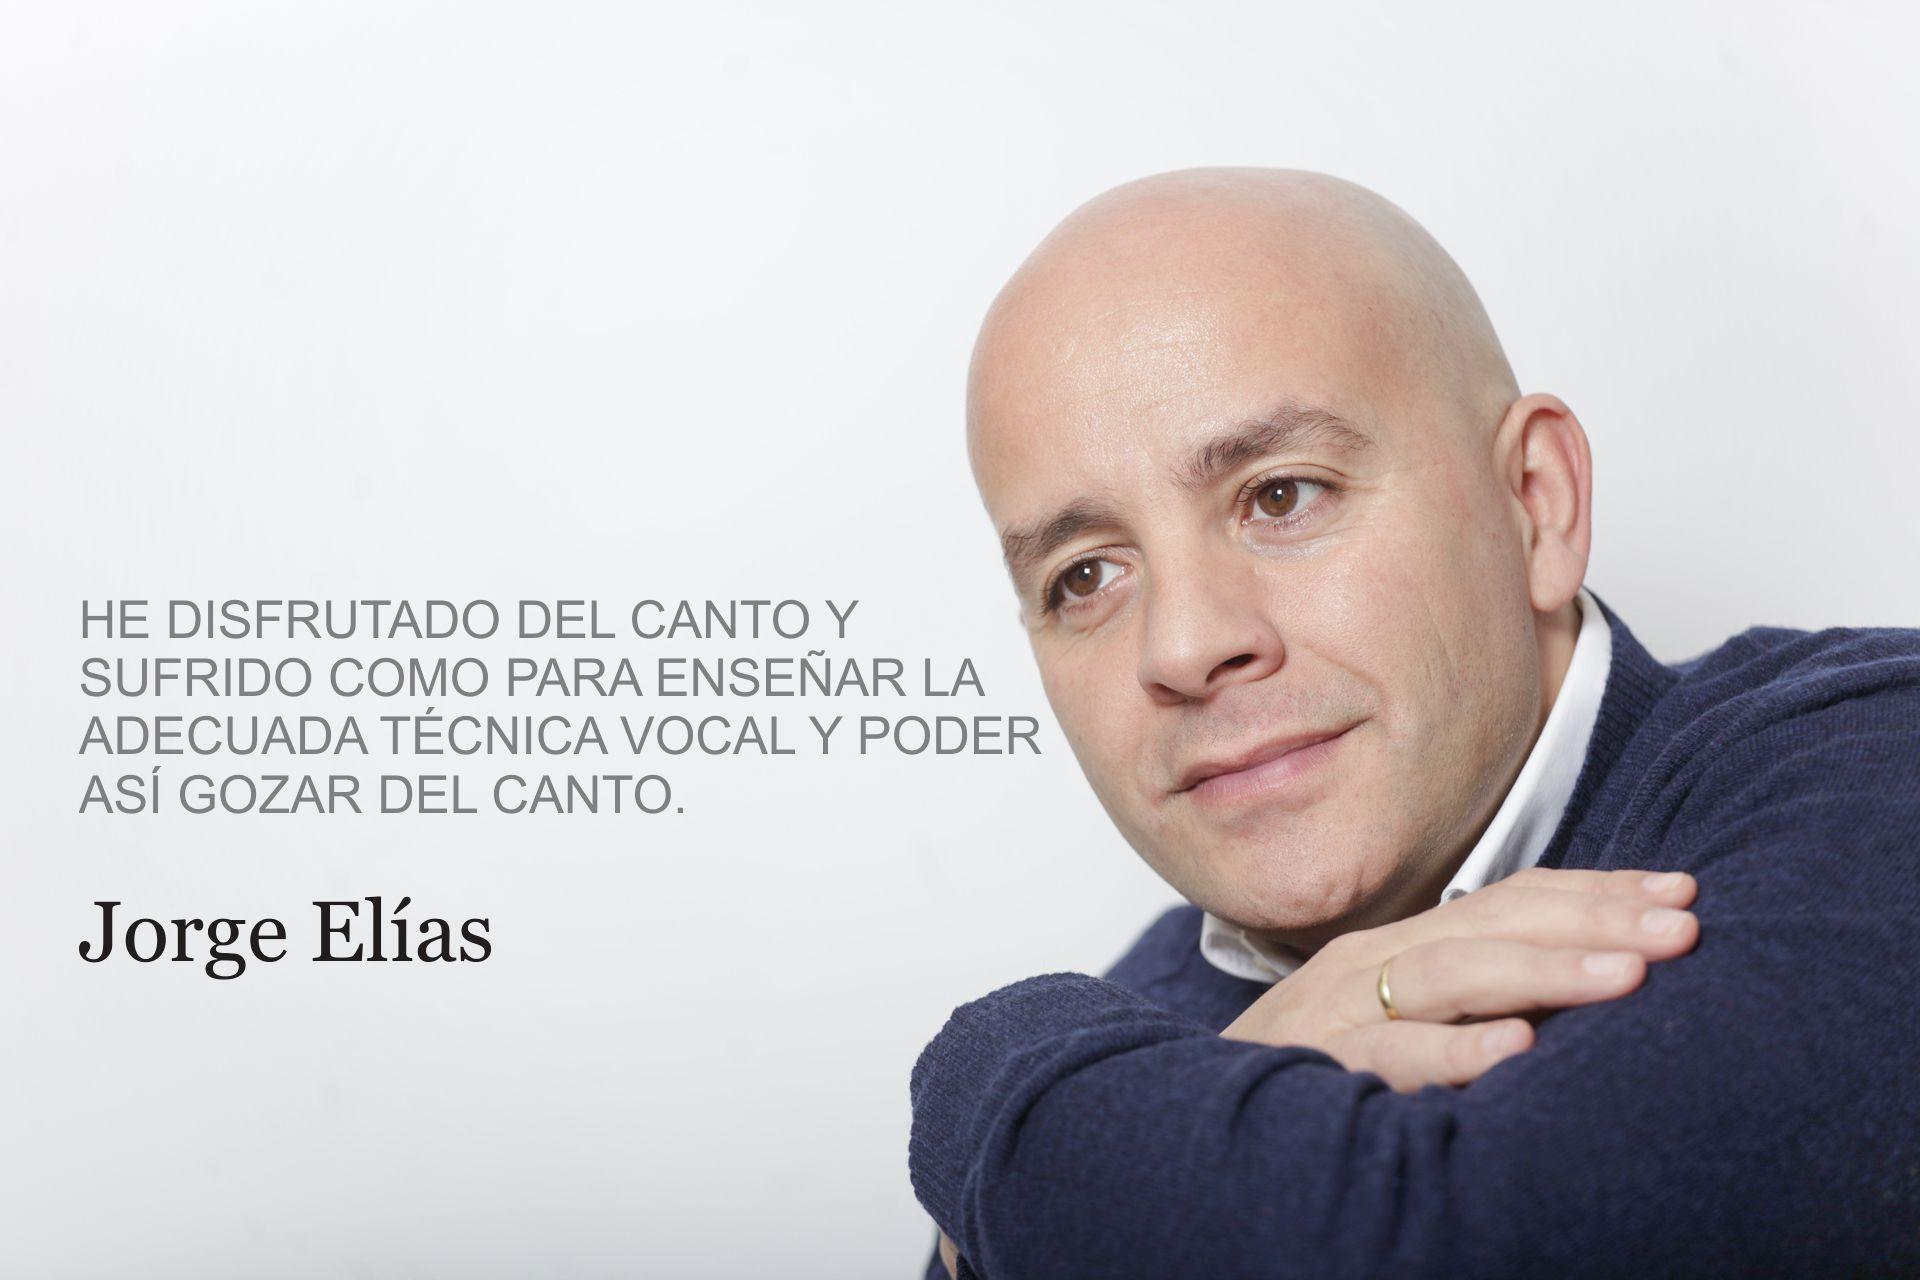 Jorge Elías cabecera móvil